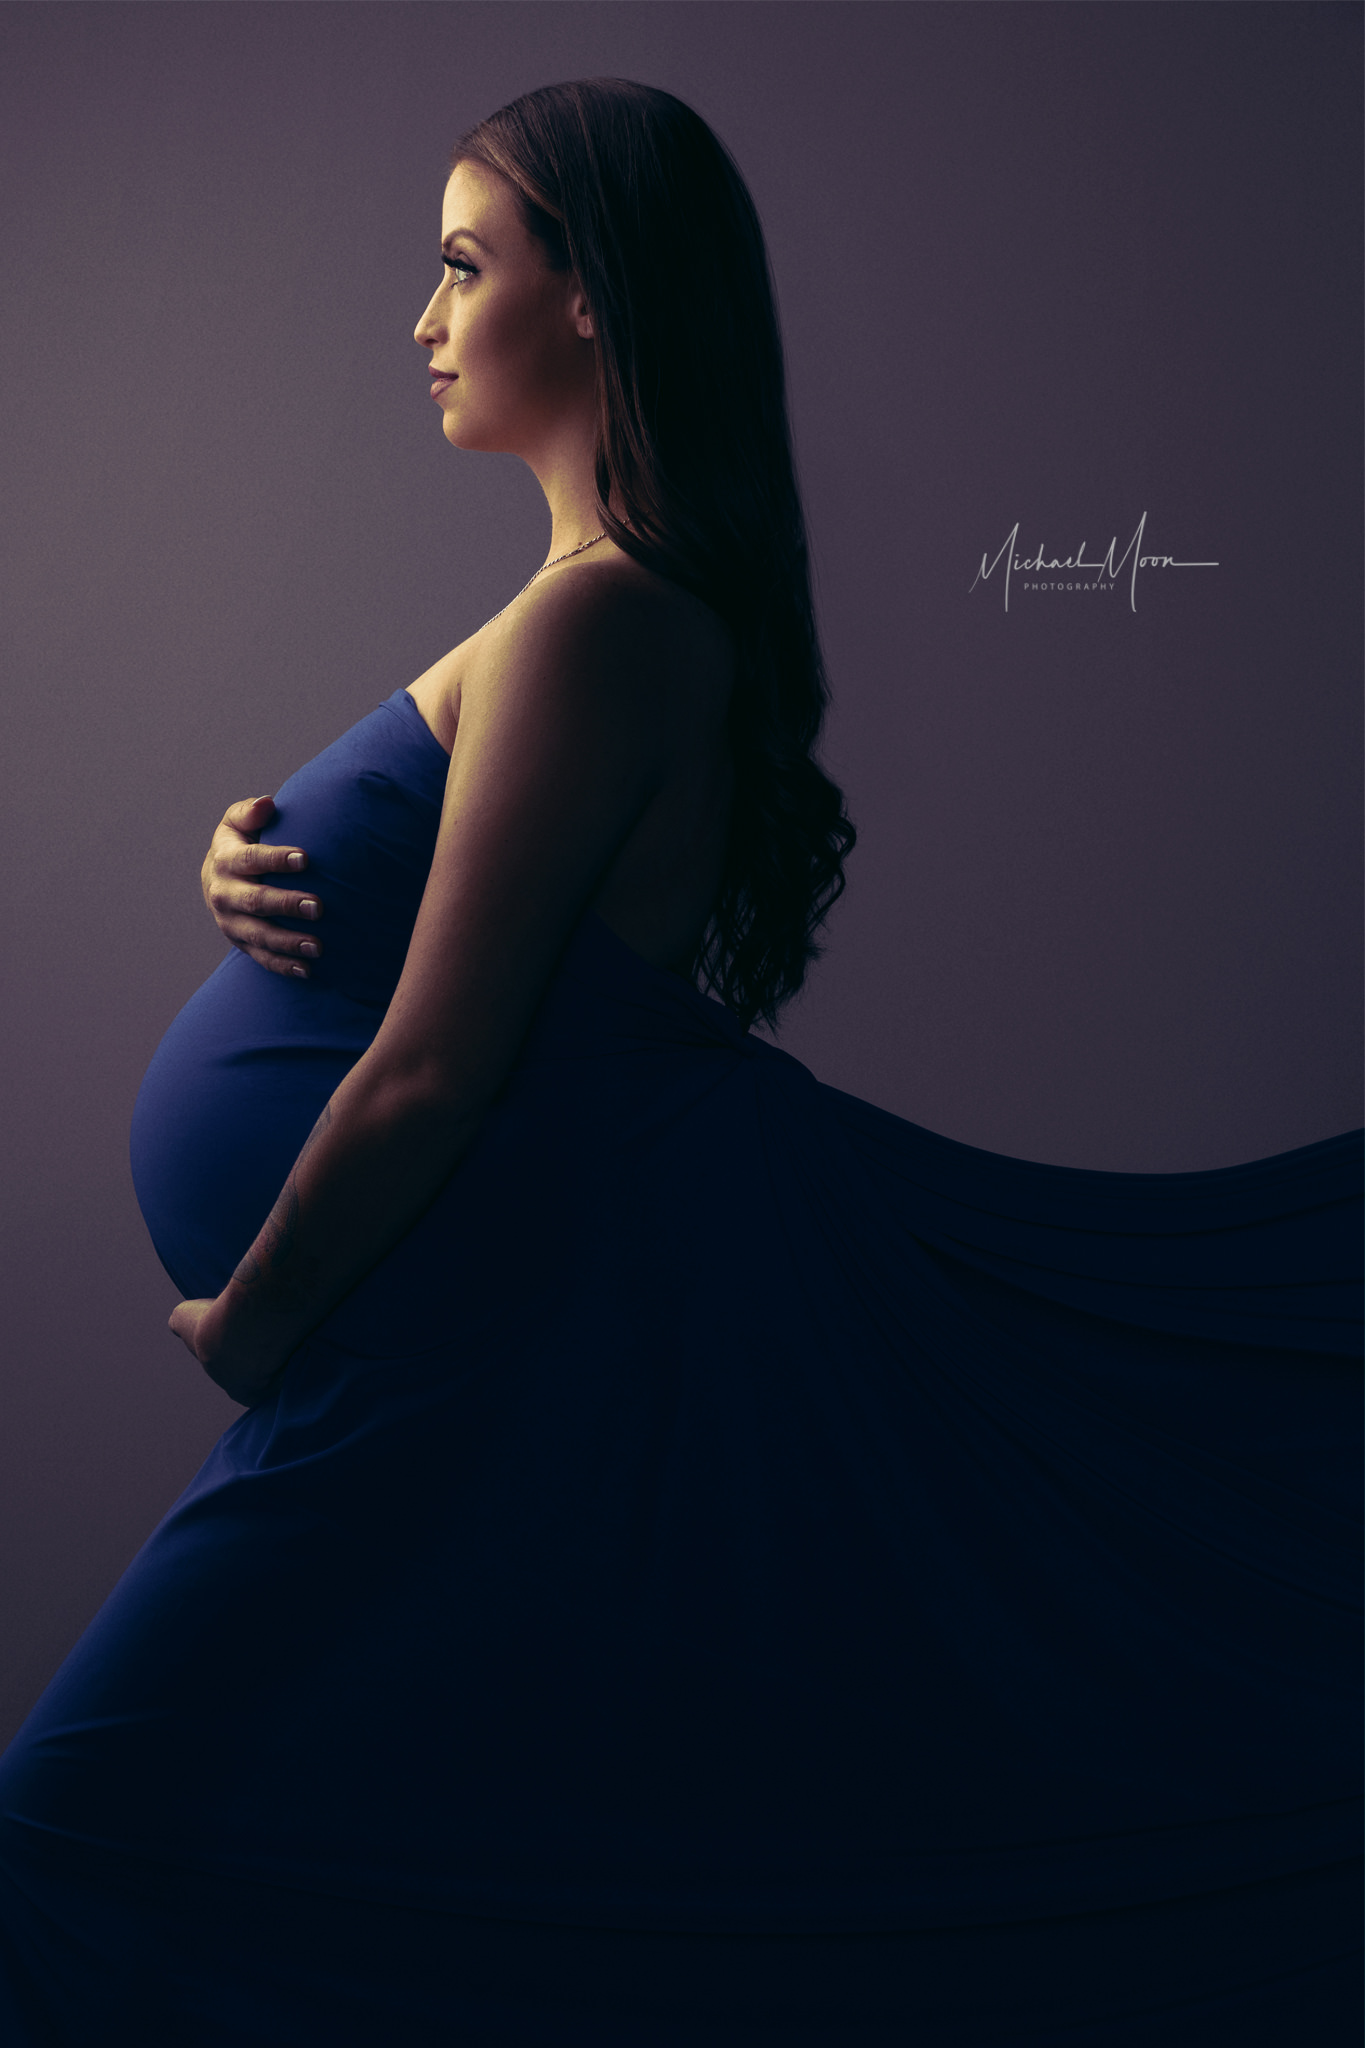 Meghan_Maternity_MichaelMoonPhotography.jpg